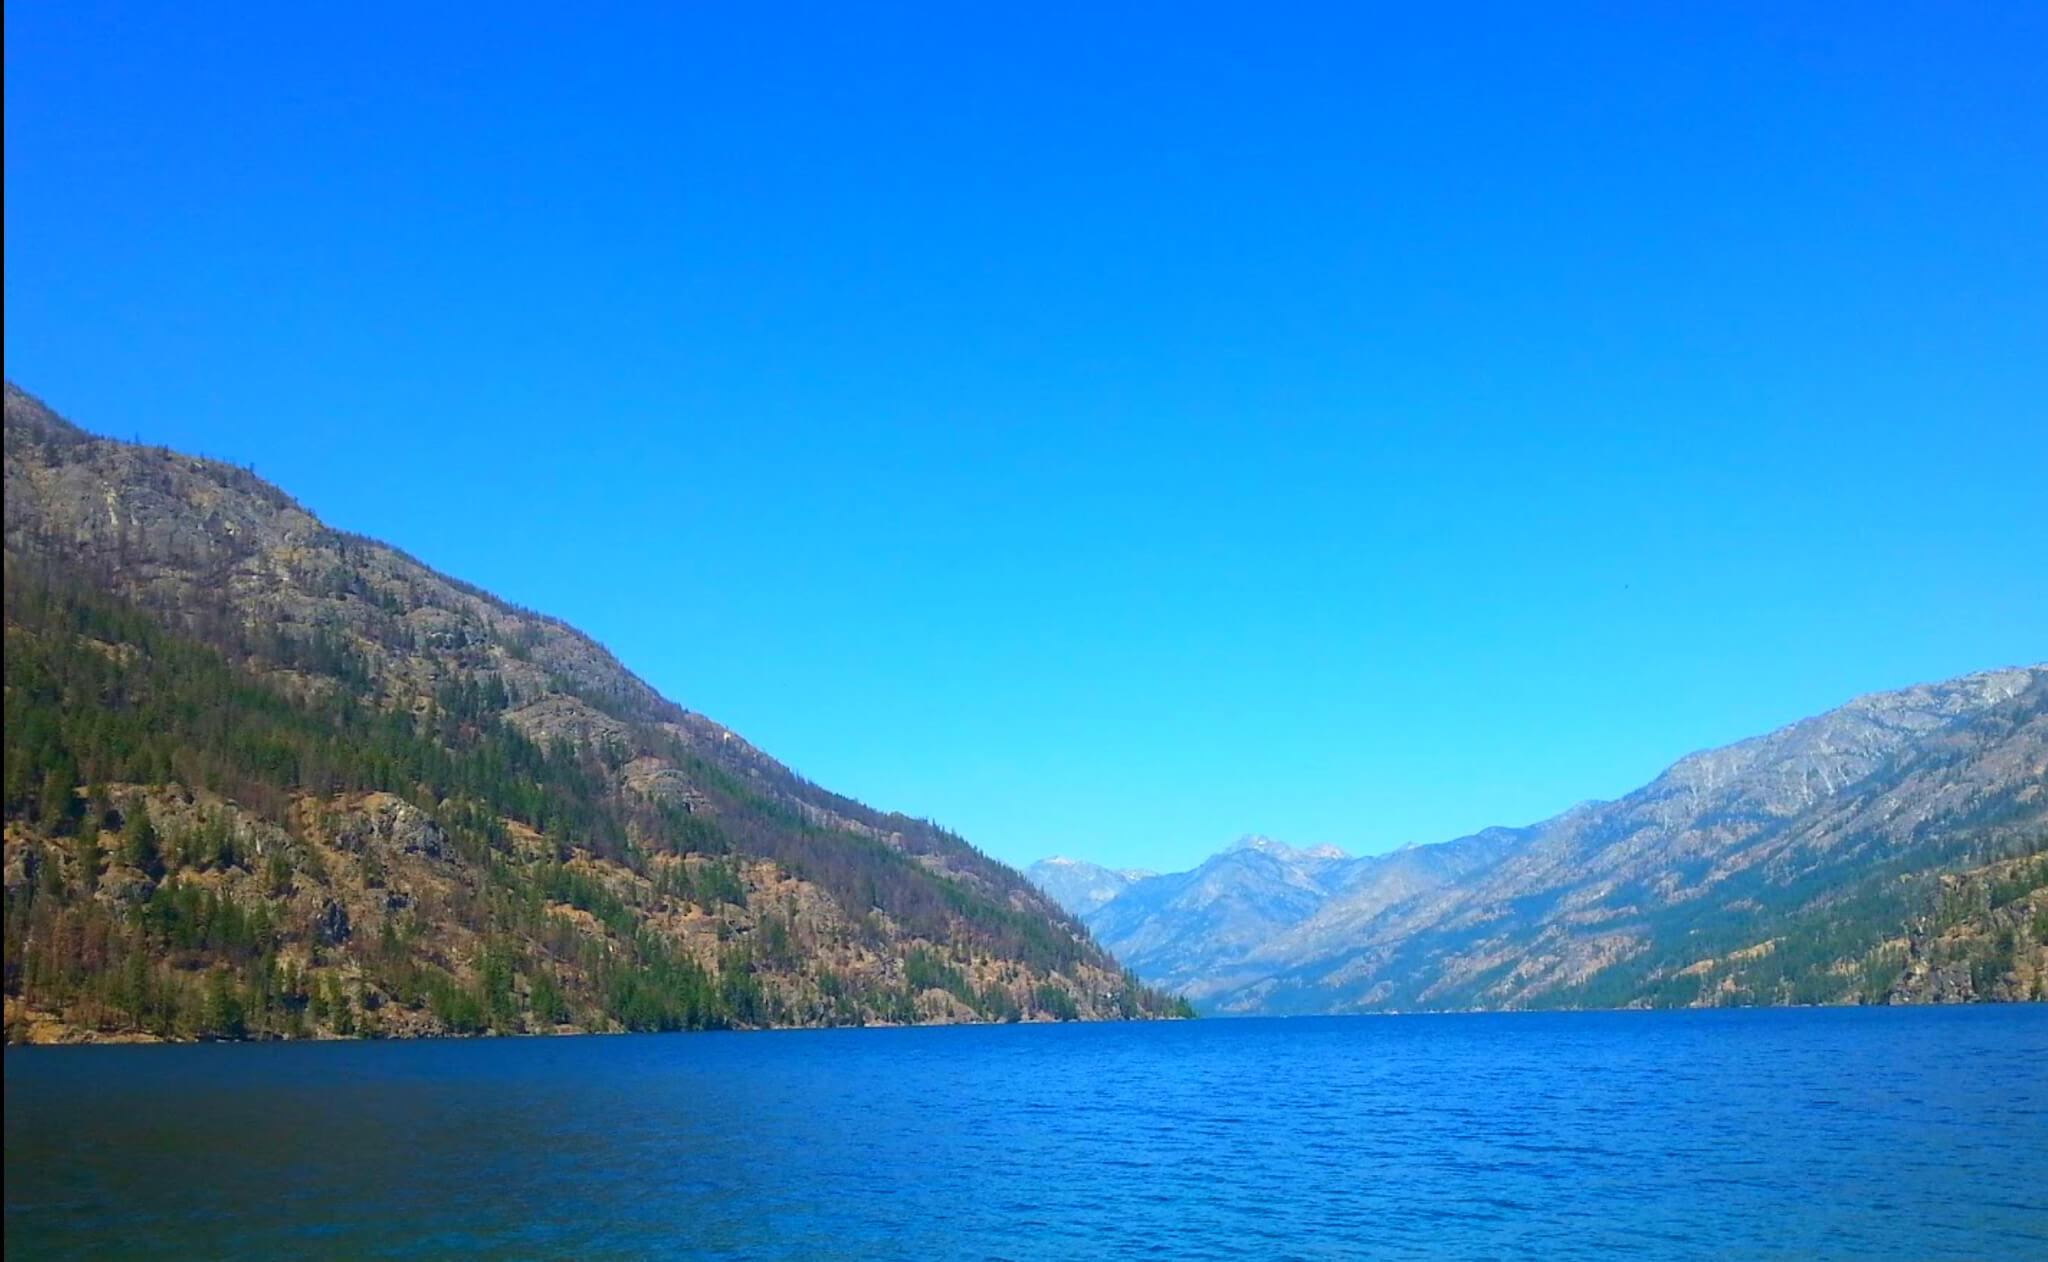 Chelan-Lake-Fishing-Report-Guide-Washington-01